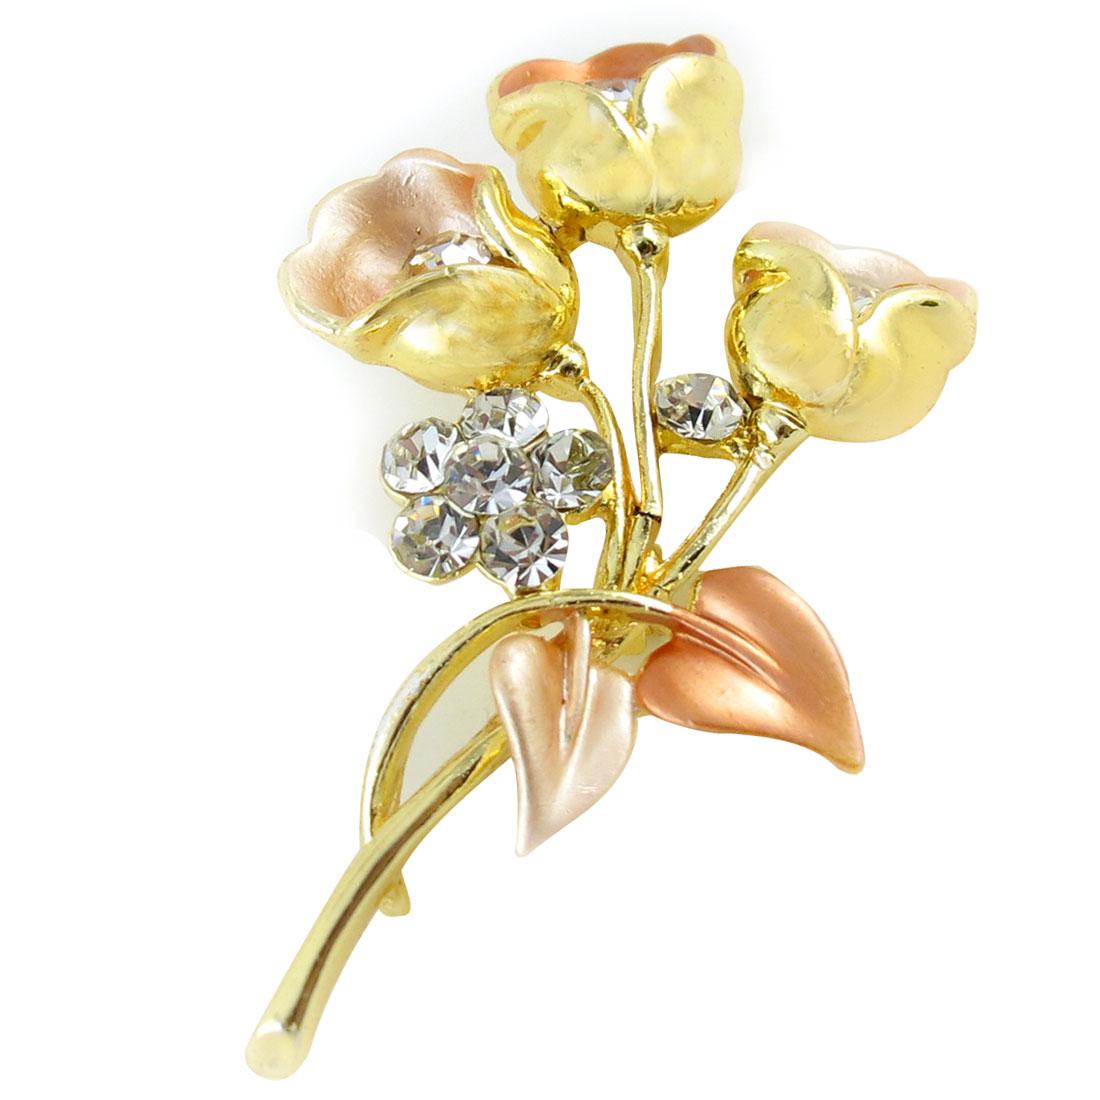 Ladies Rhinestones Inlaid Metal Flowers Brooch Breast Pin Decor Gold Tone Pink